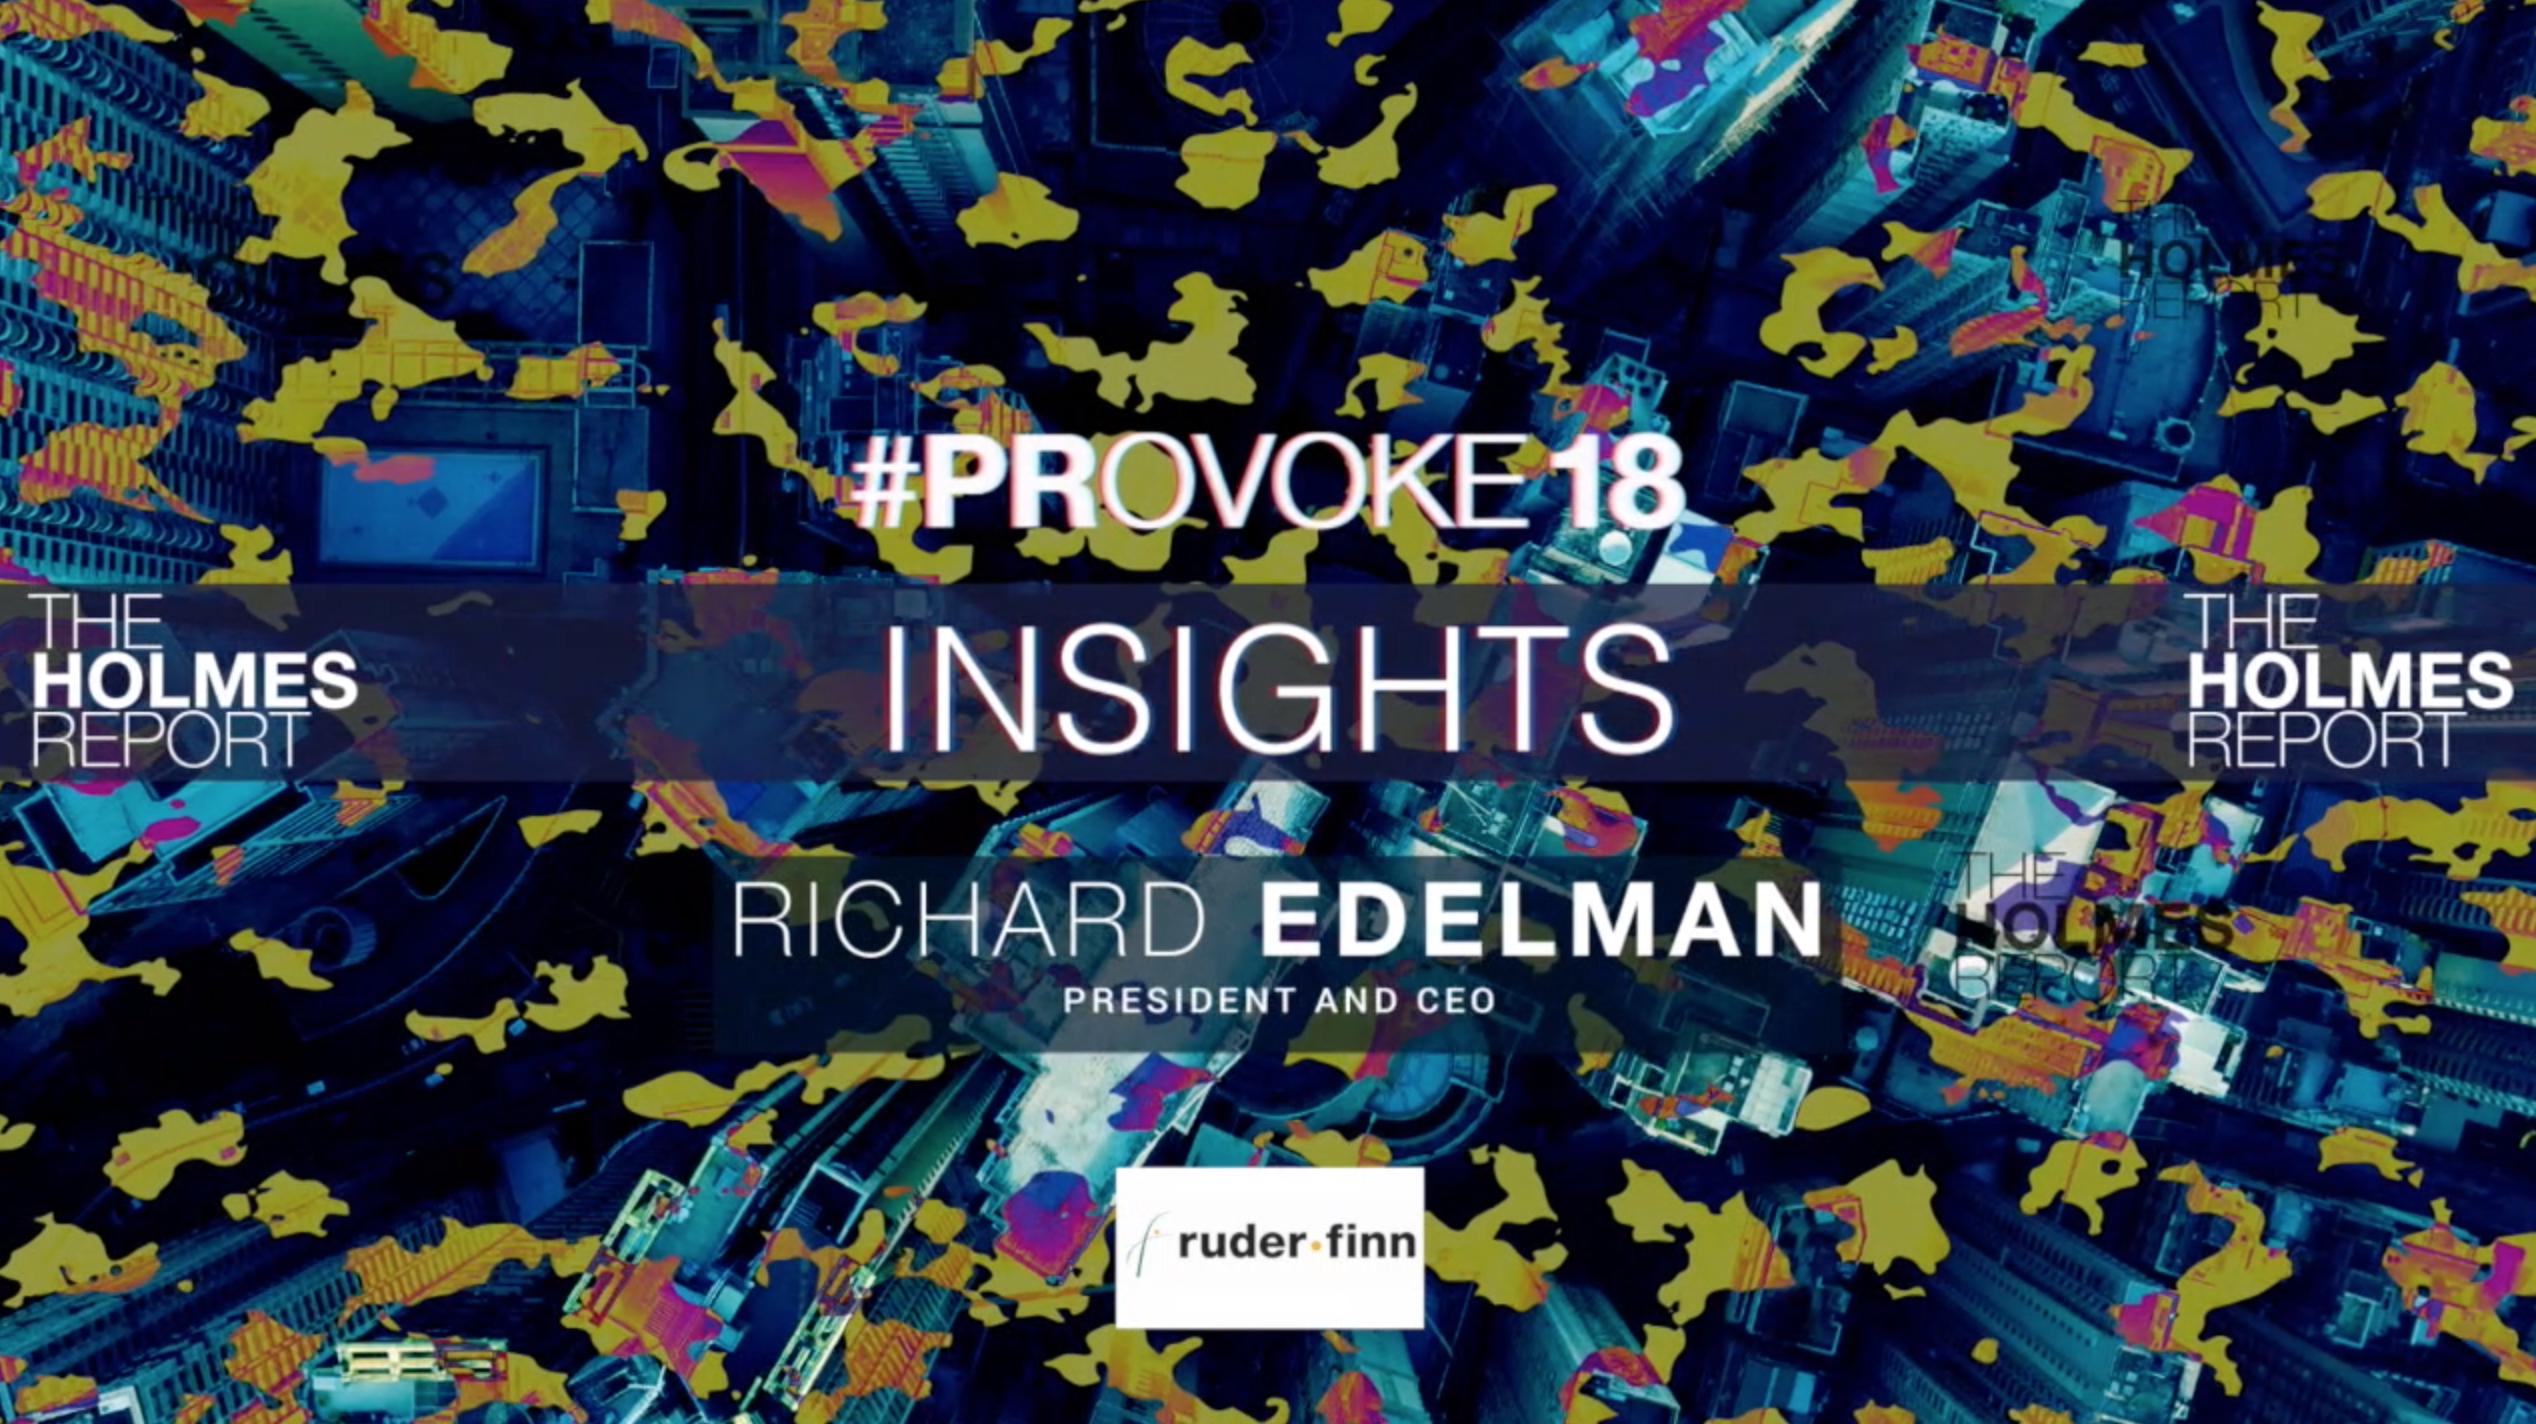 Video: PRovoke18 Insights From Richard Edelman